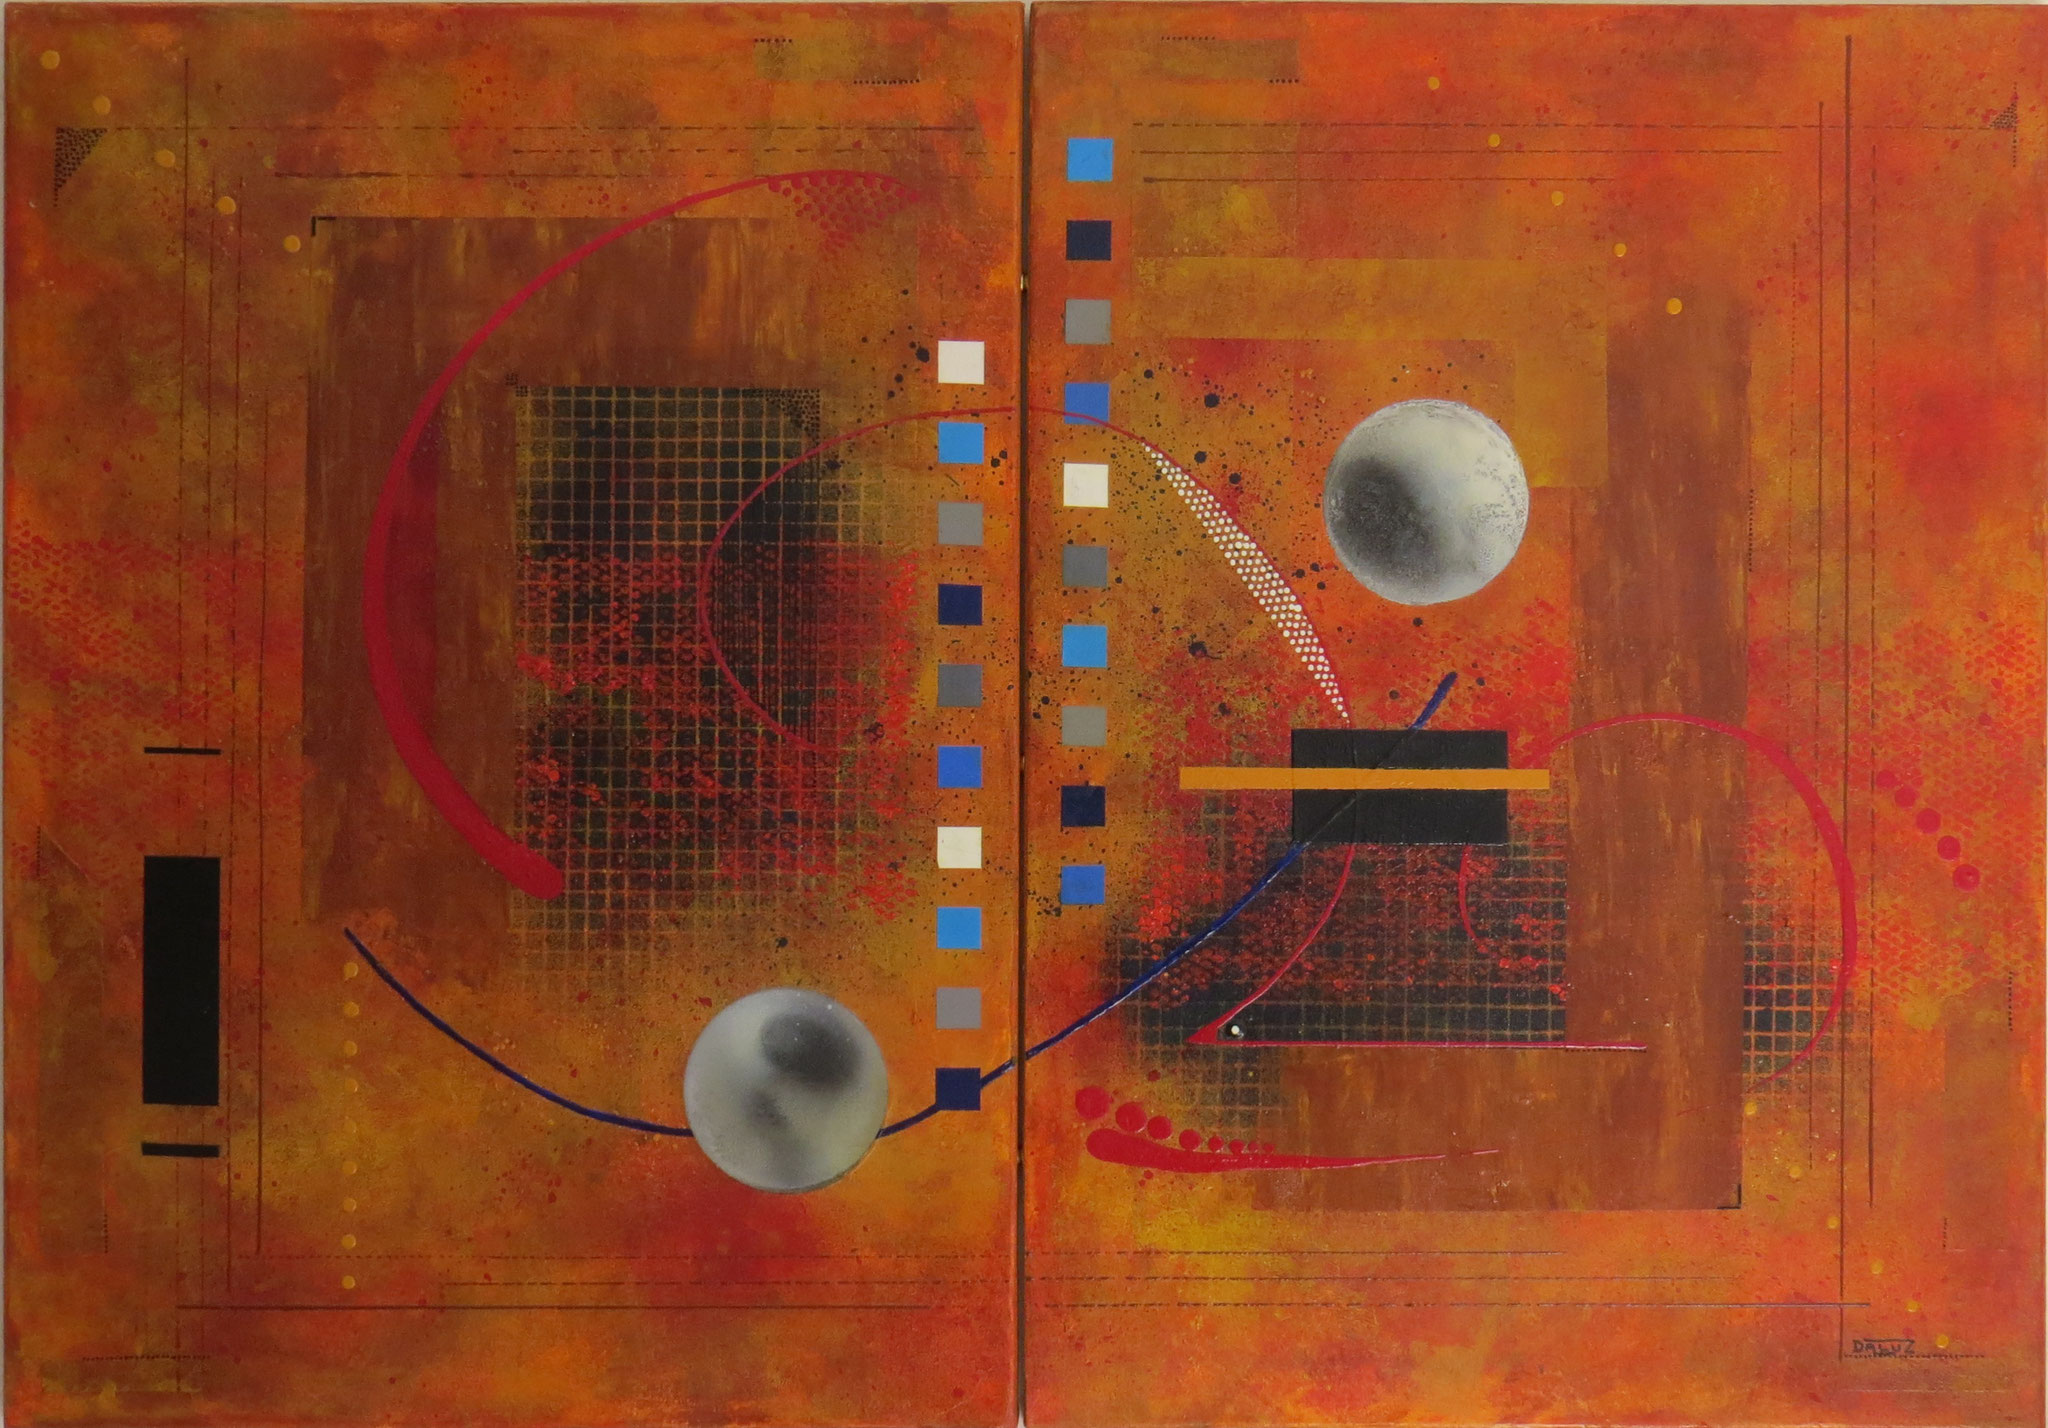 dzëta - vue facé1 - DALUZ GALEGO - peinture abstraite